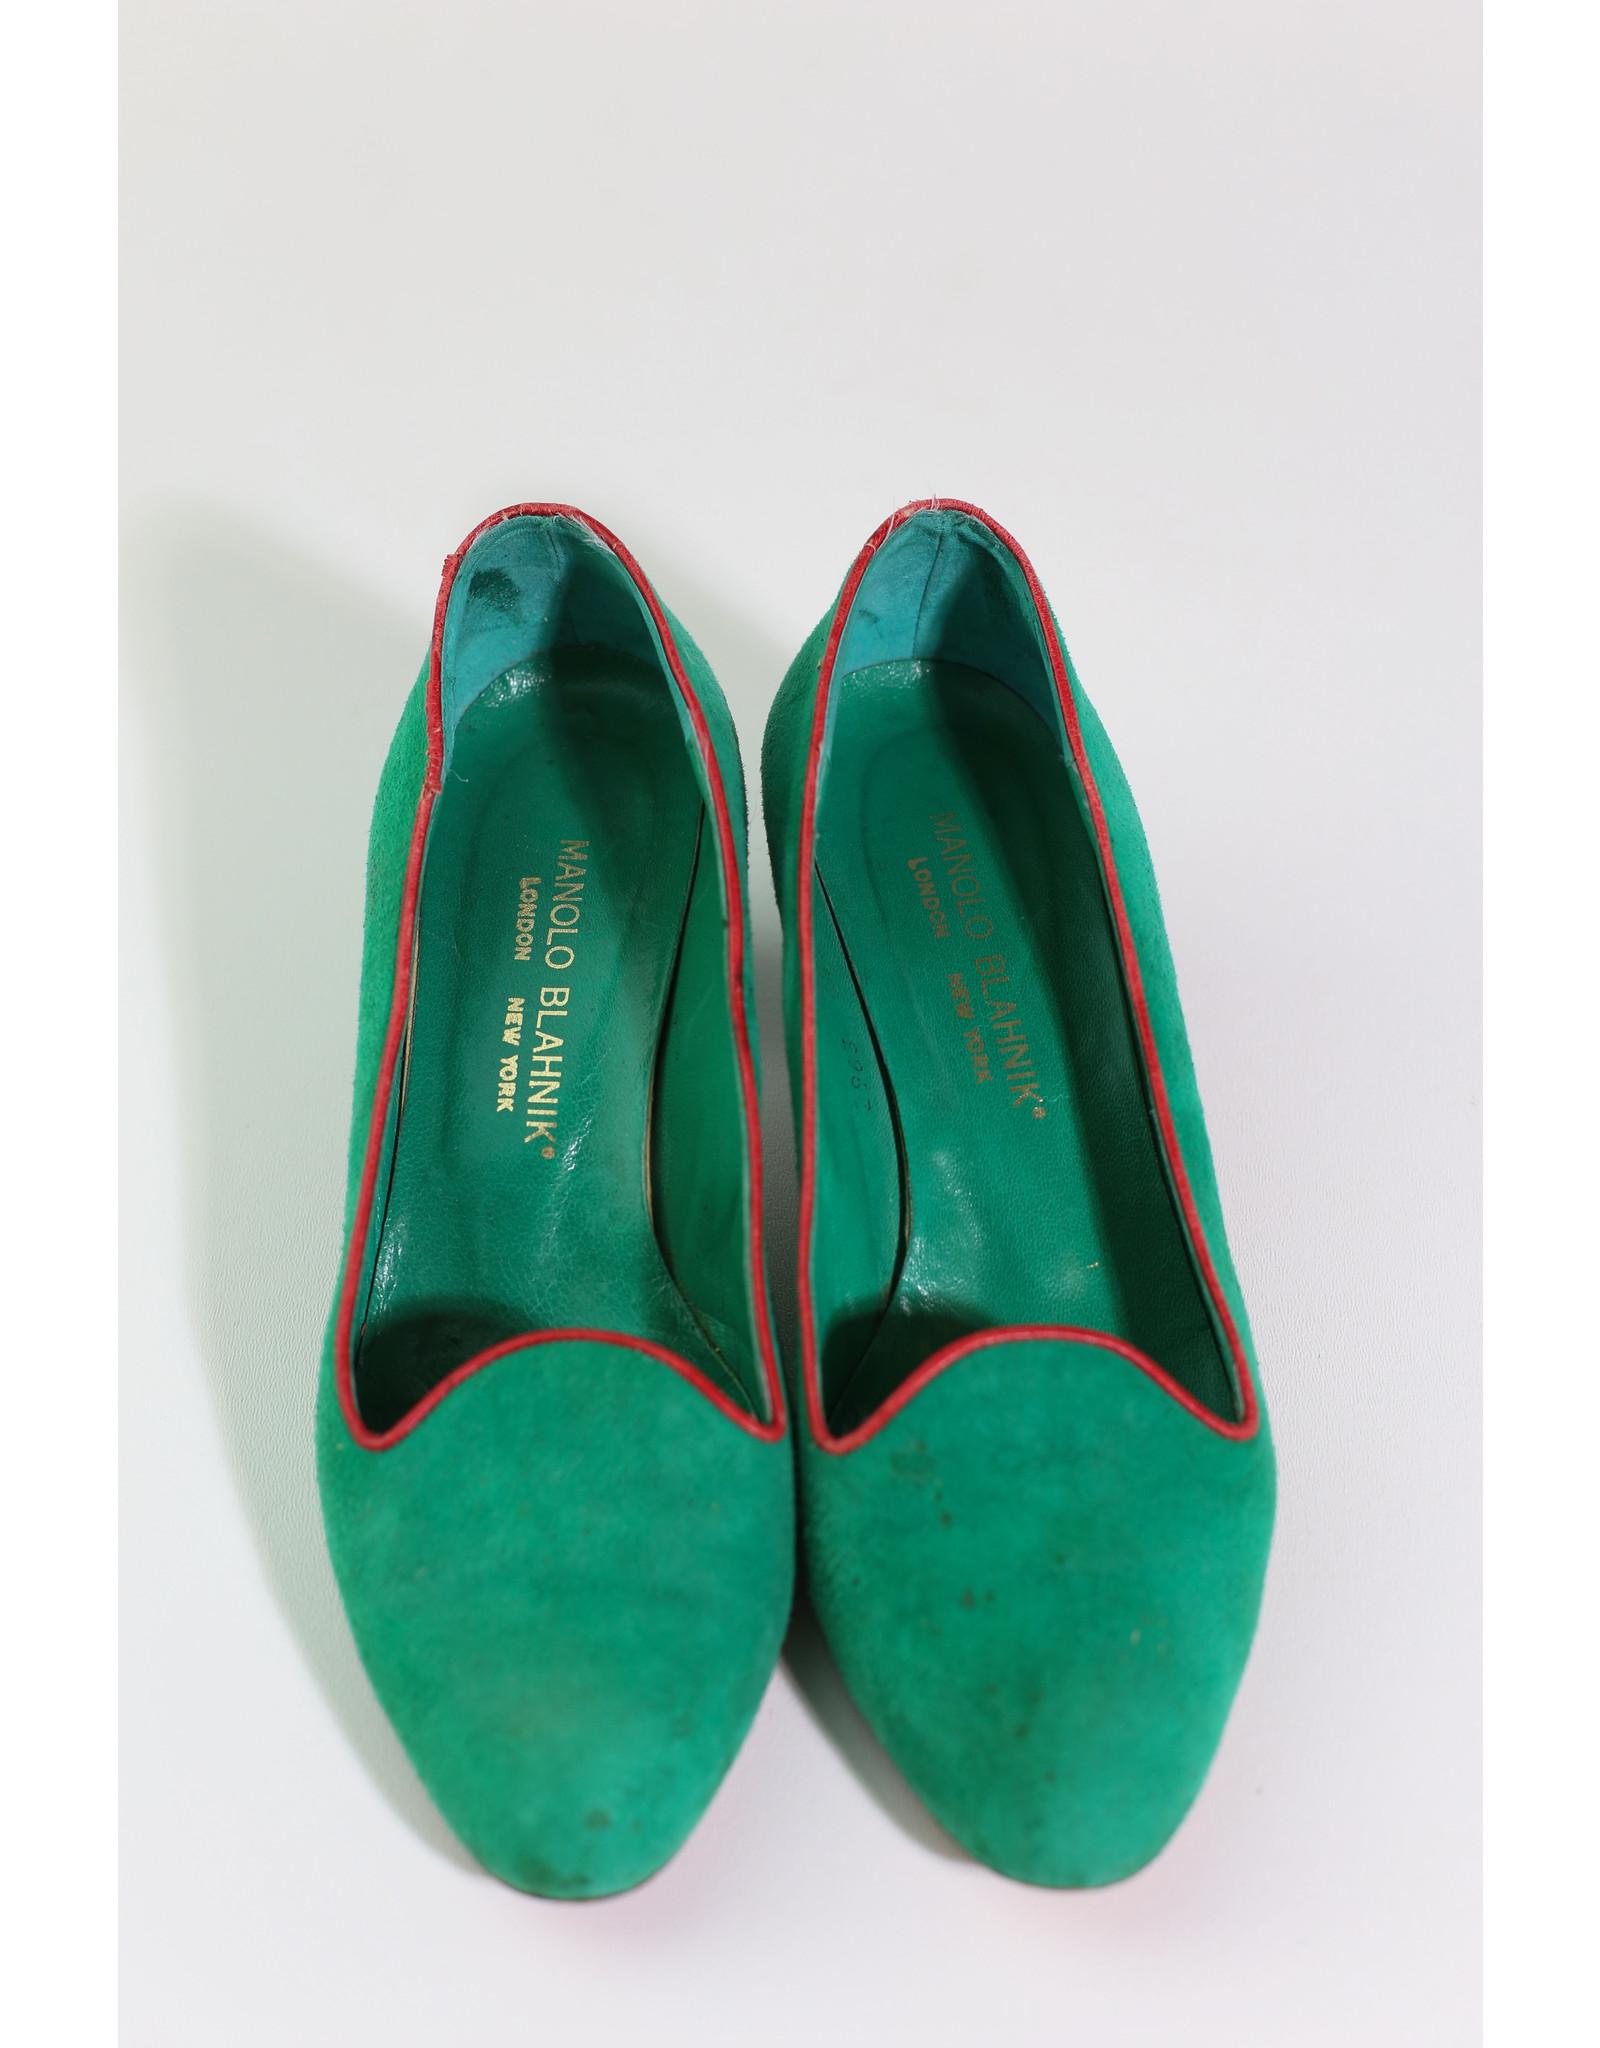 1960's Emerald Manolo Blahnik pumps 6.5